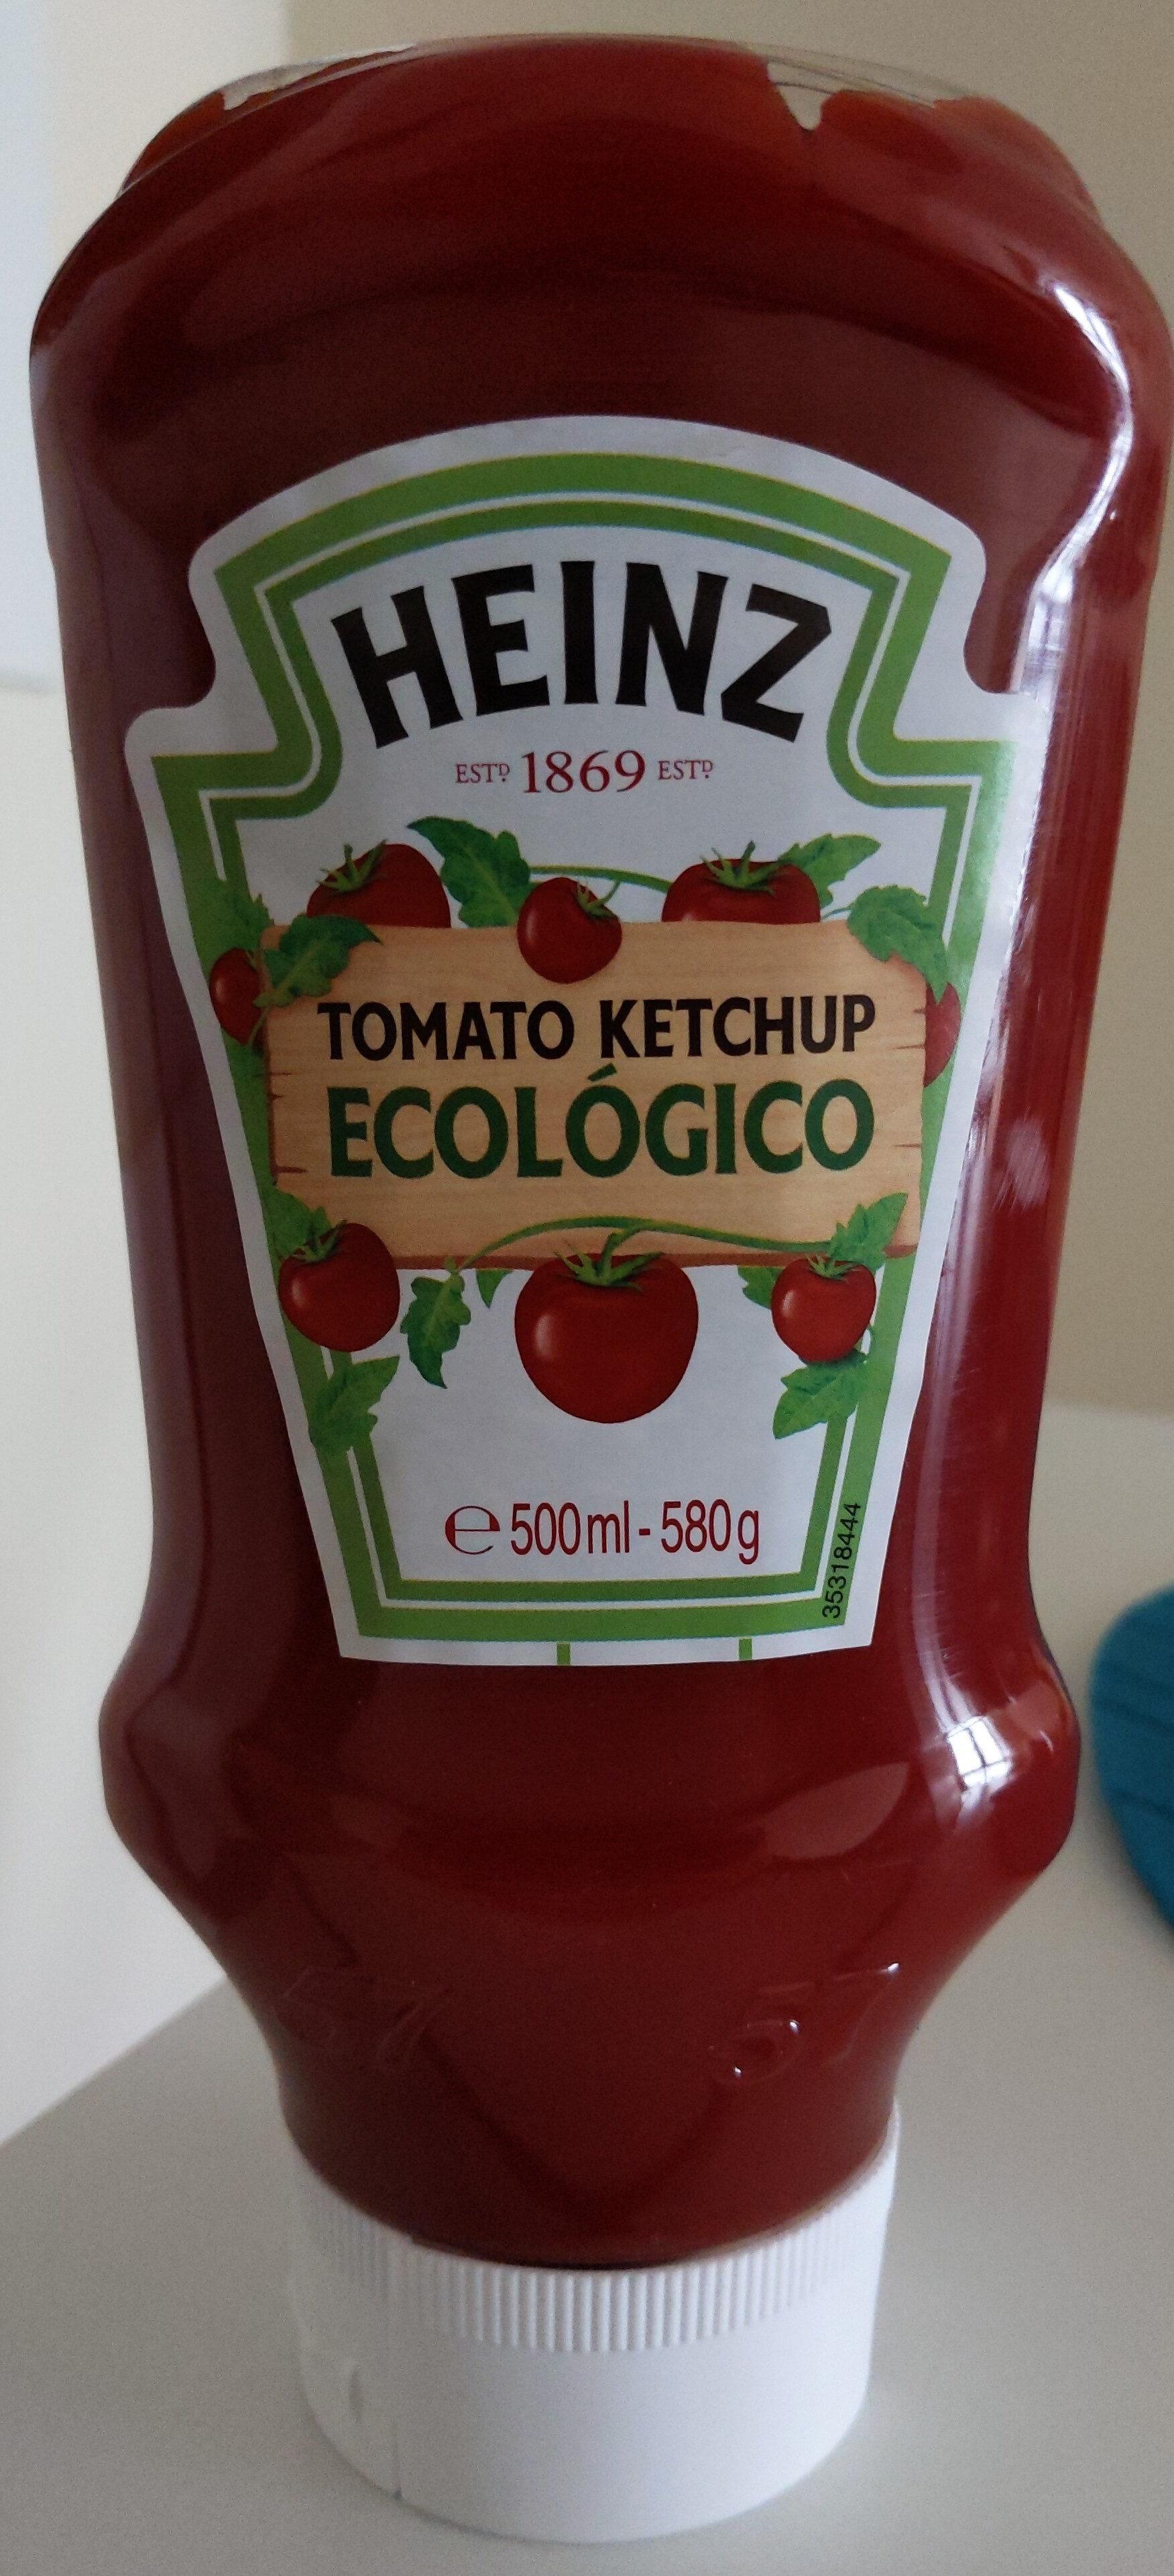 Tomato Ketchup BIO - Producto - es